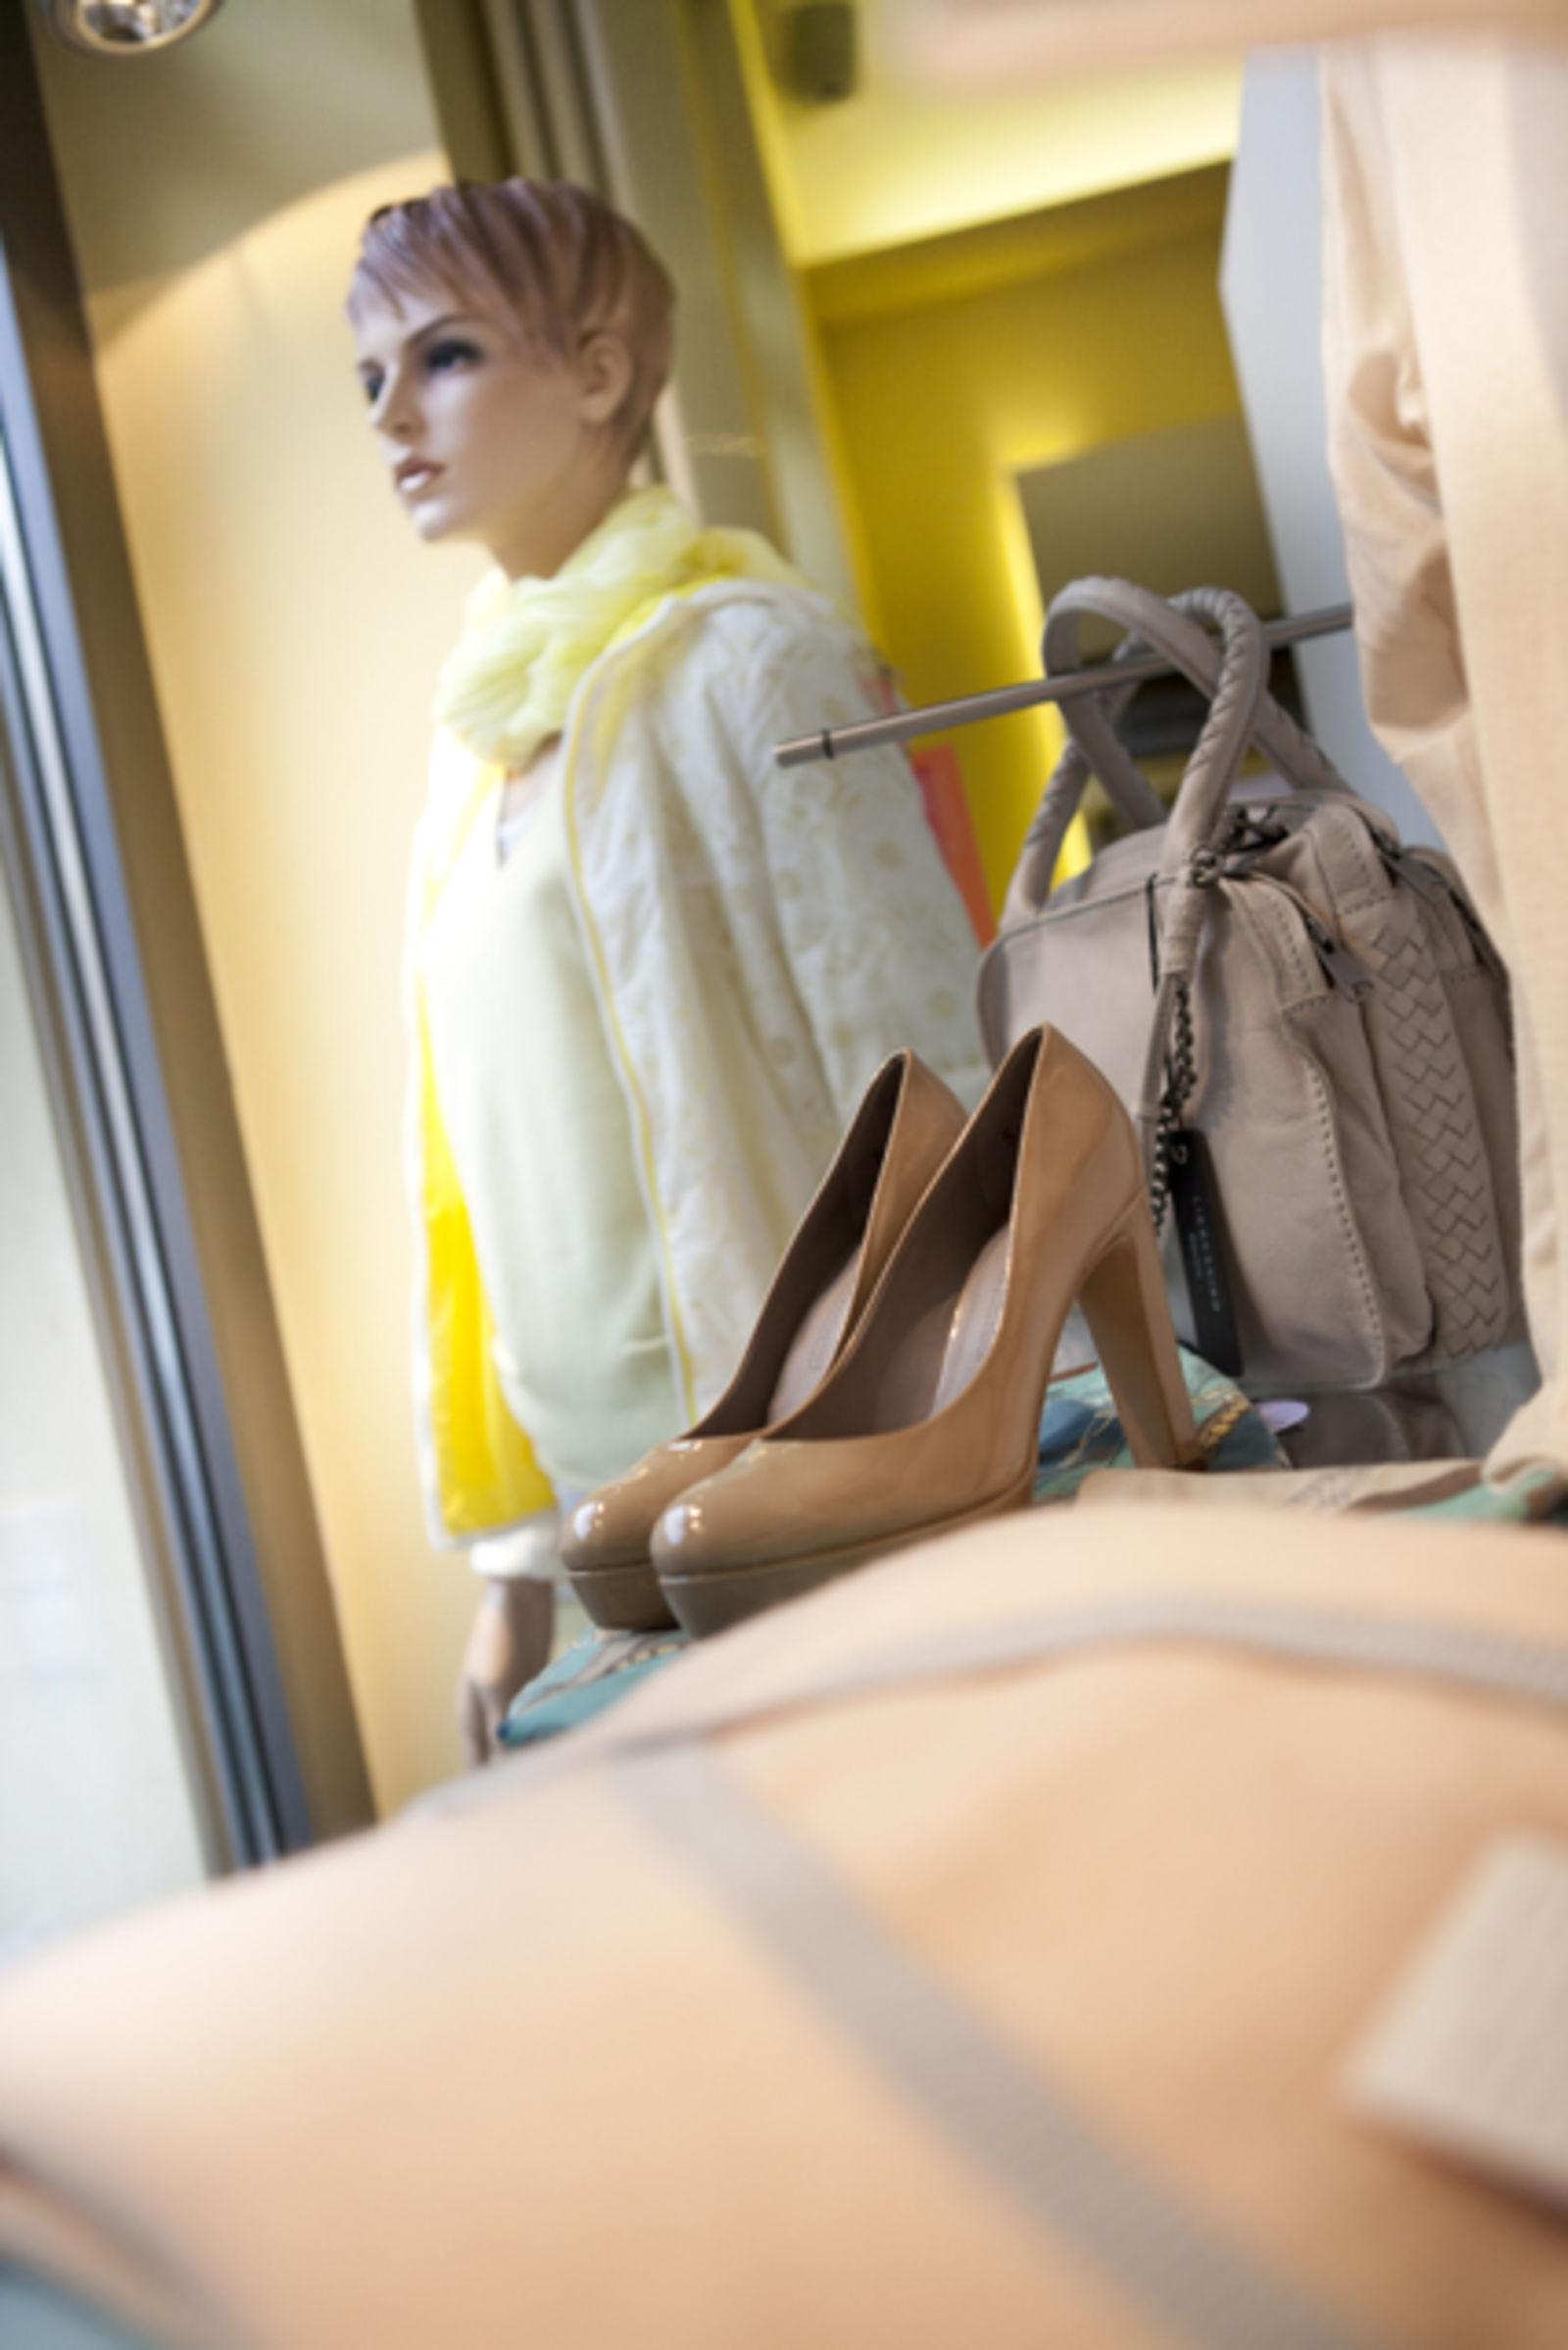 Vera Ensinger Shoes & Fashion in Heidelberg (Bild 11)